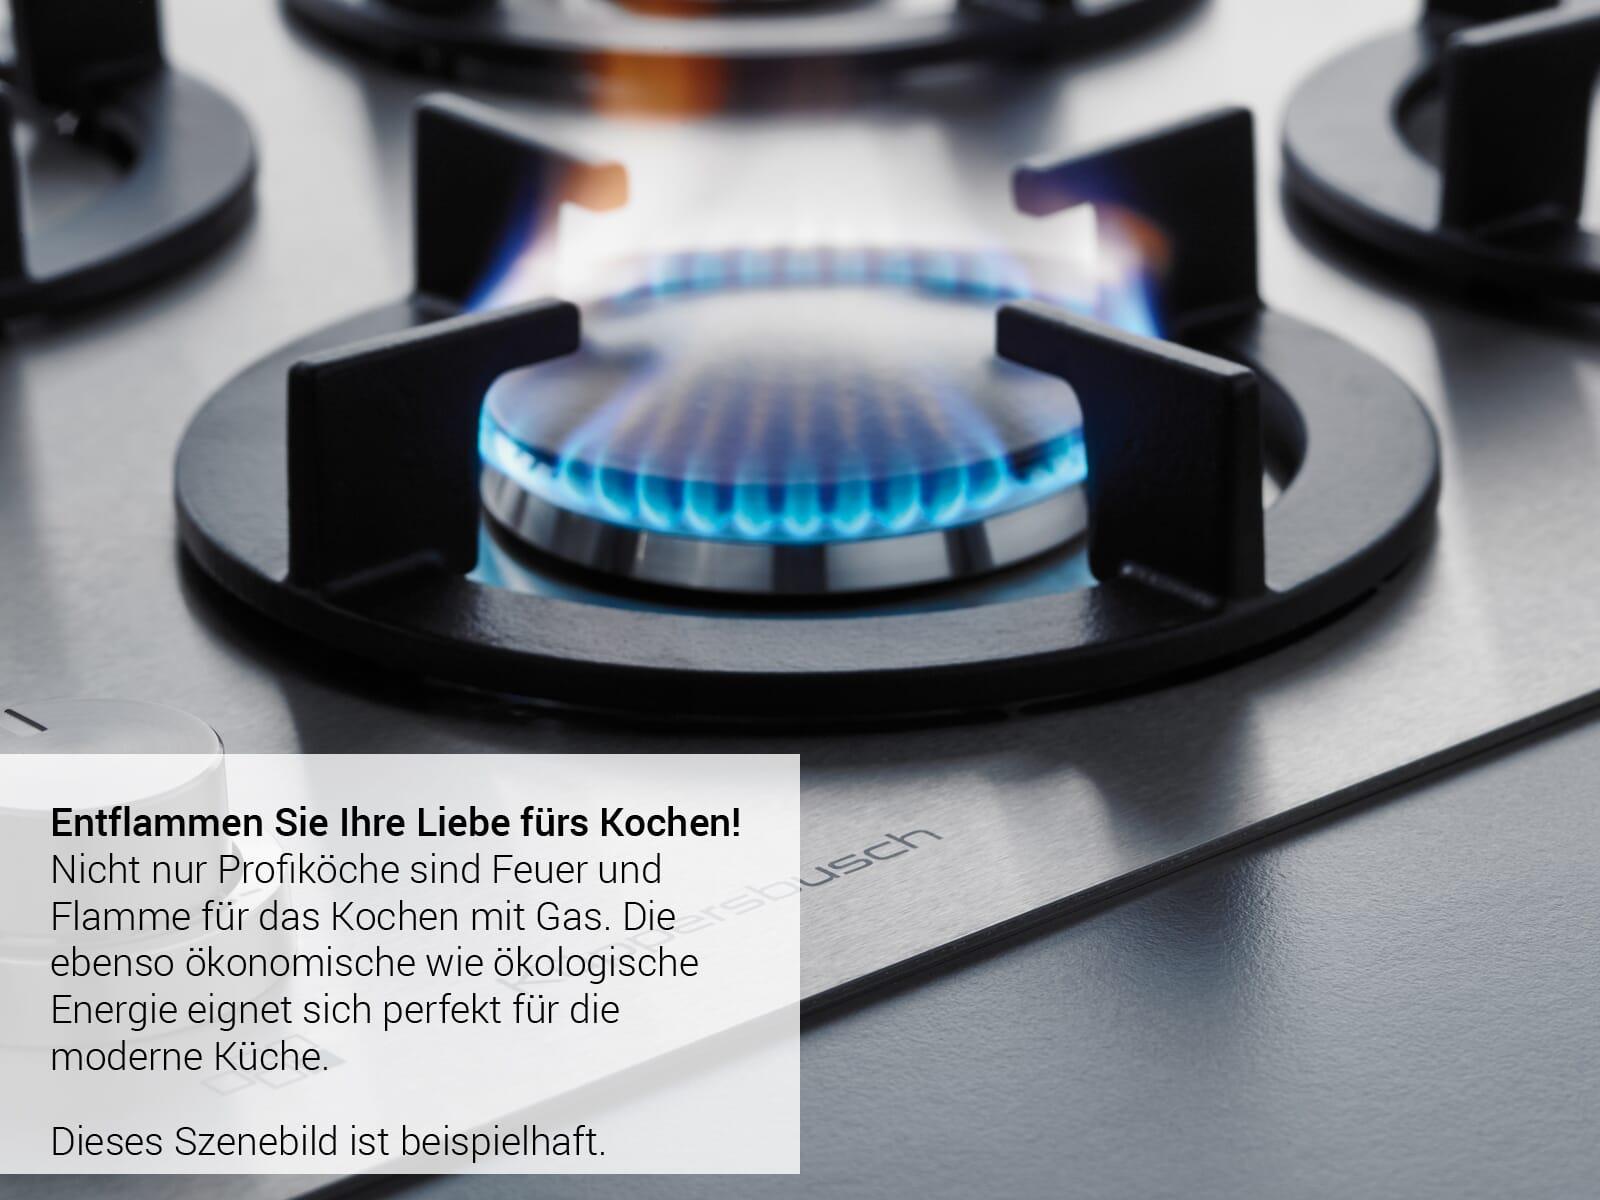 Küppersbusch GKS 9851.0 ED K-Series. 8 Gaskochfeld autark